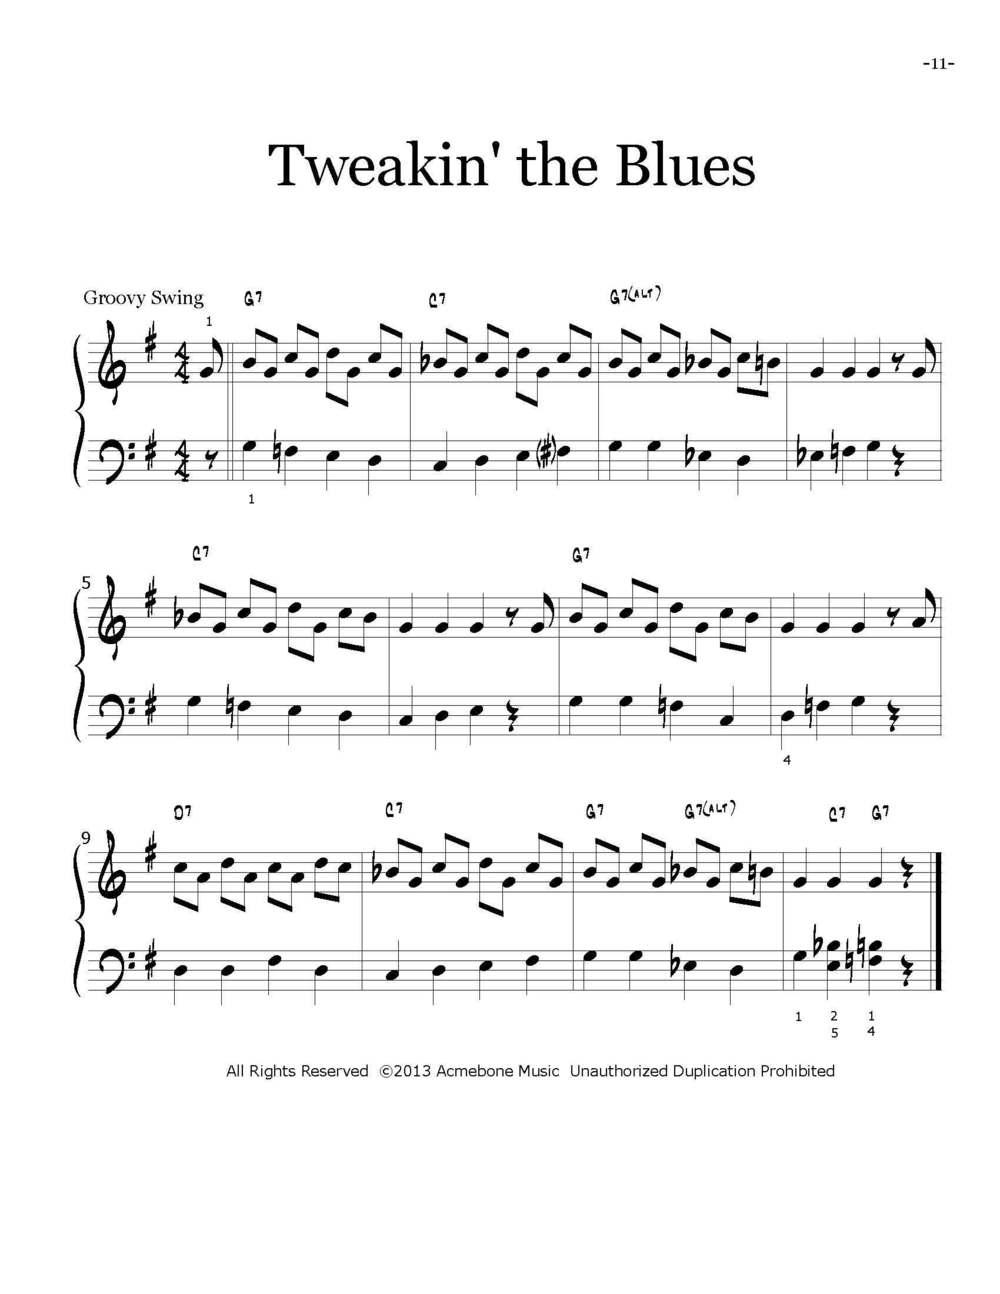 Progressive Jazz Etudes for Piano bk1 for web_Page_12.jpg